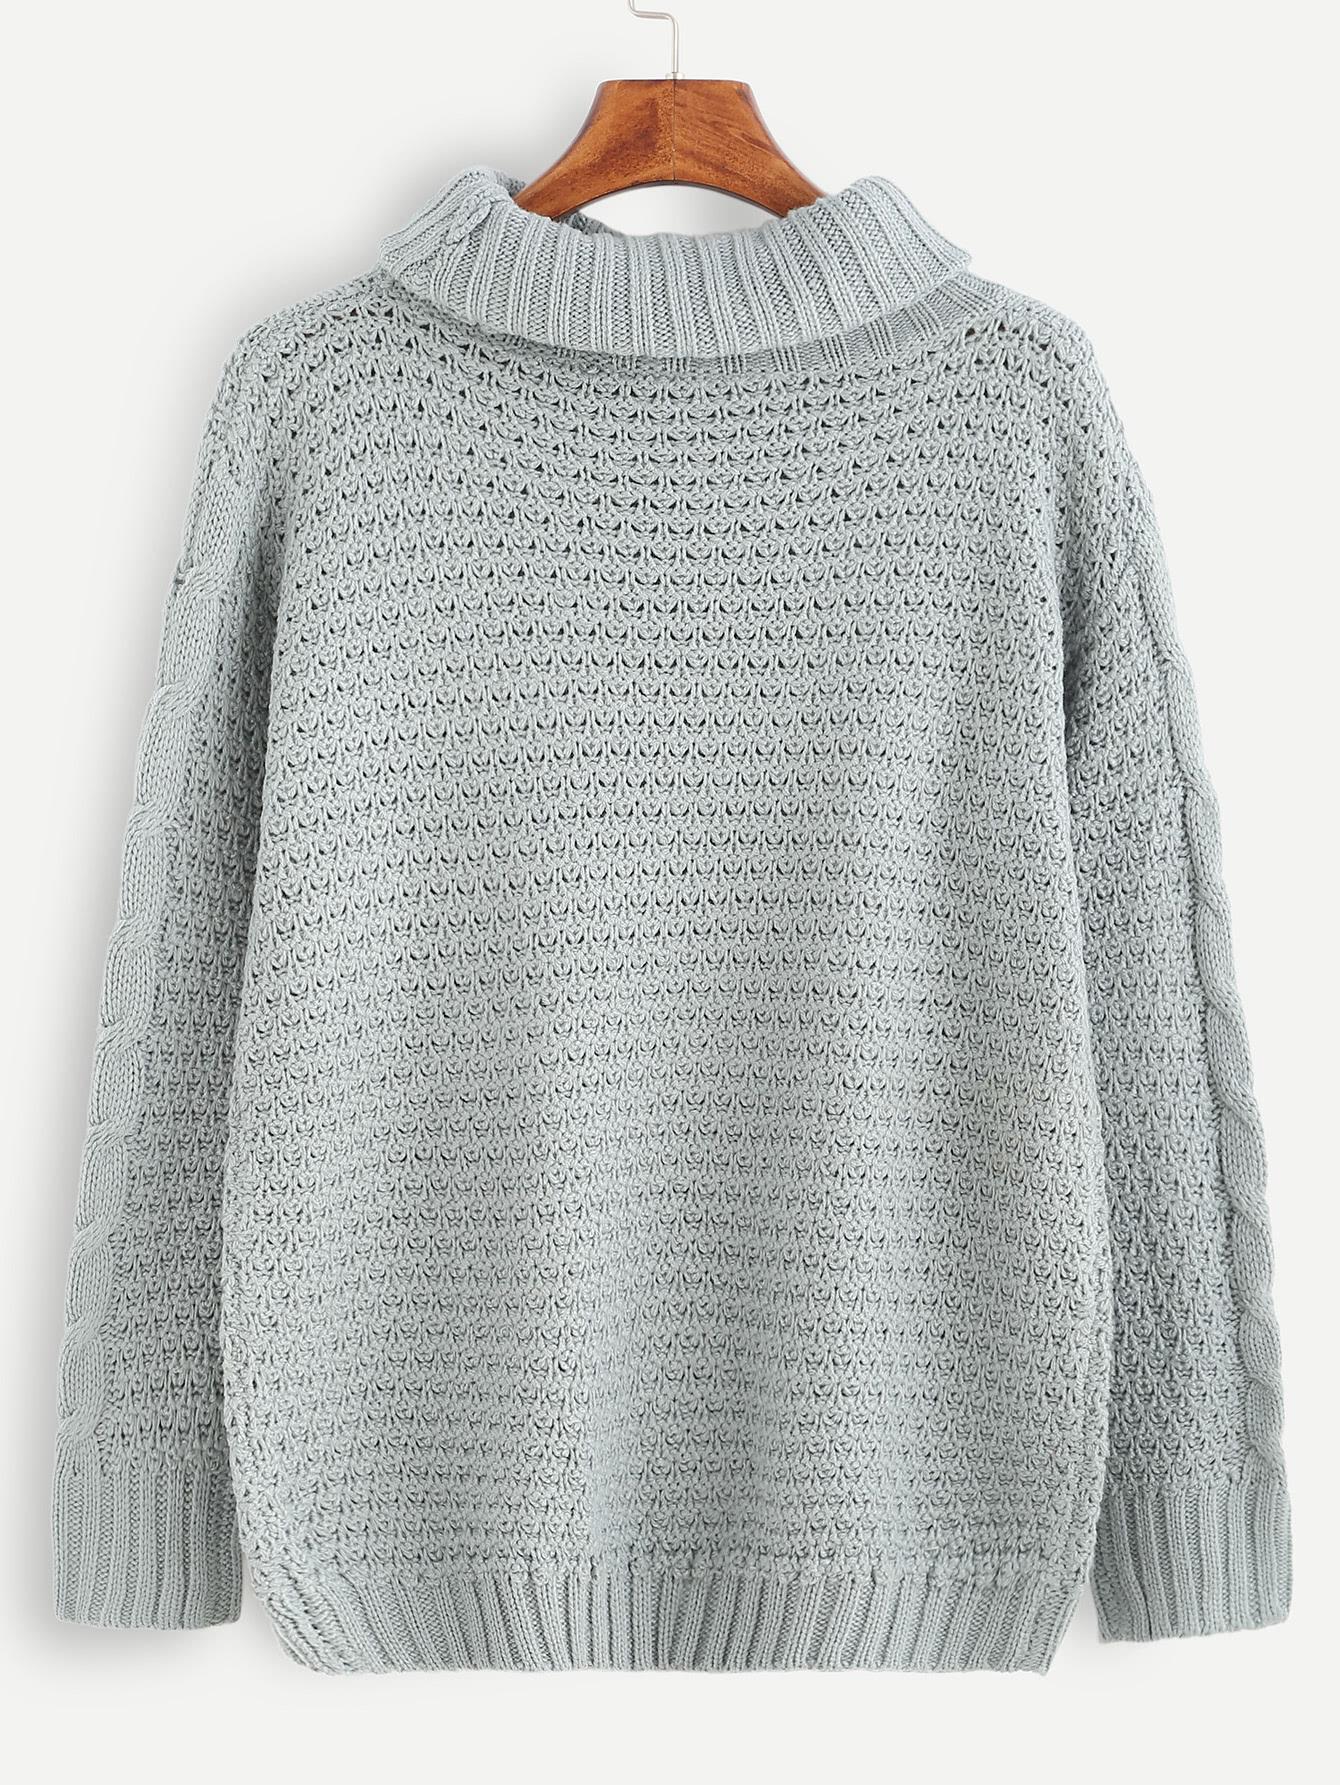 sweater161026450_2